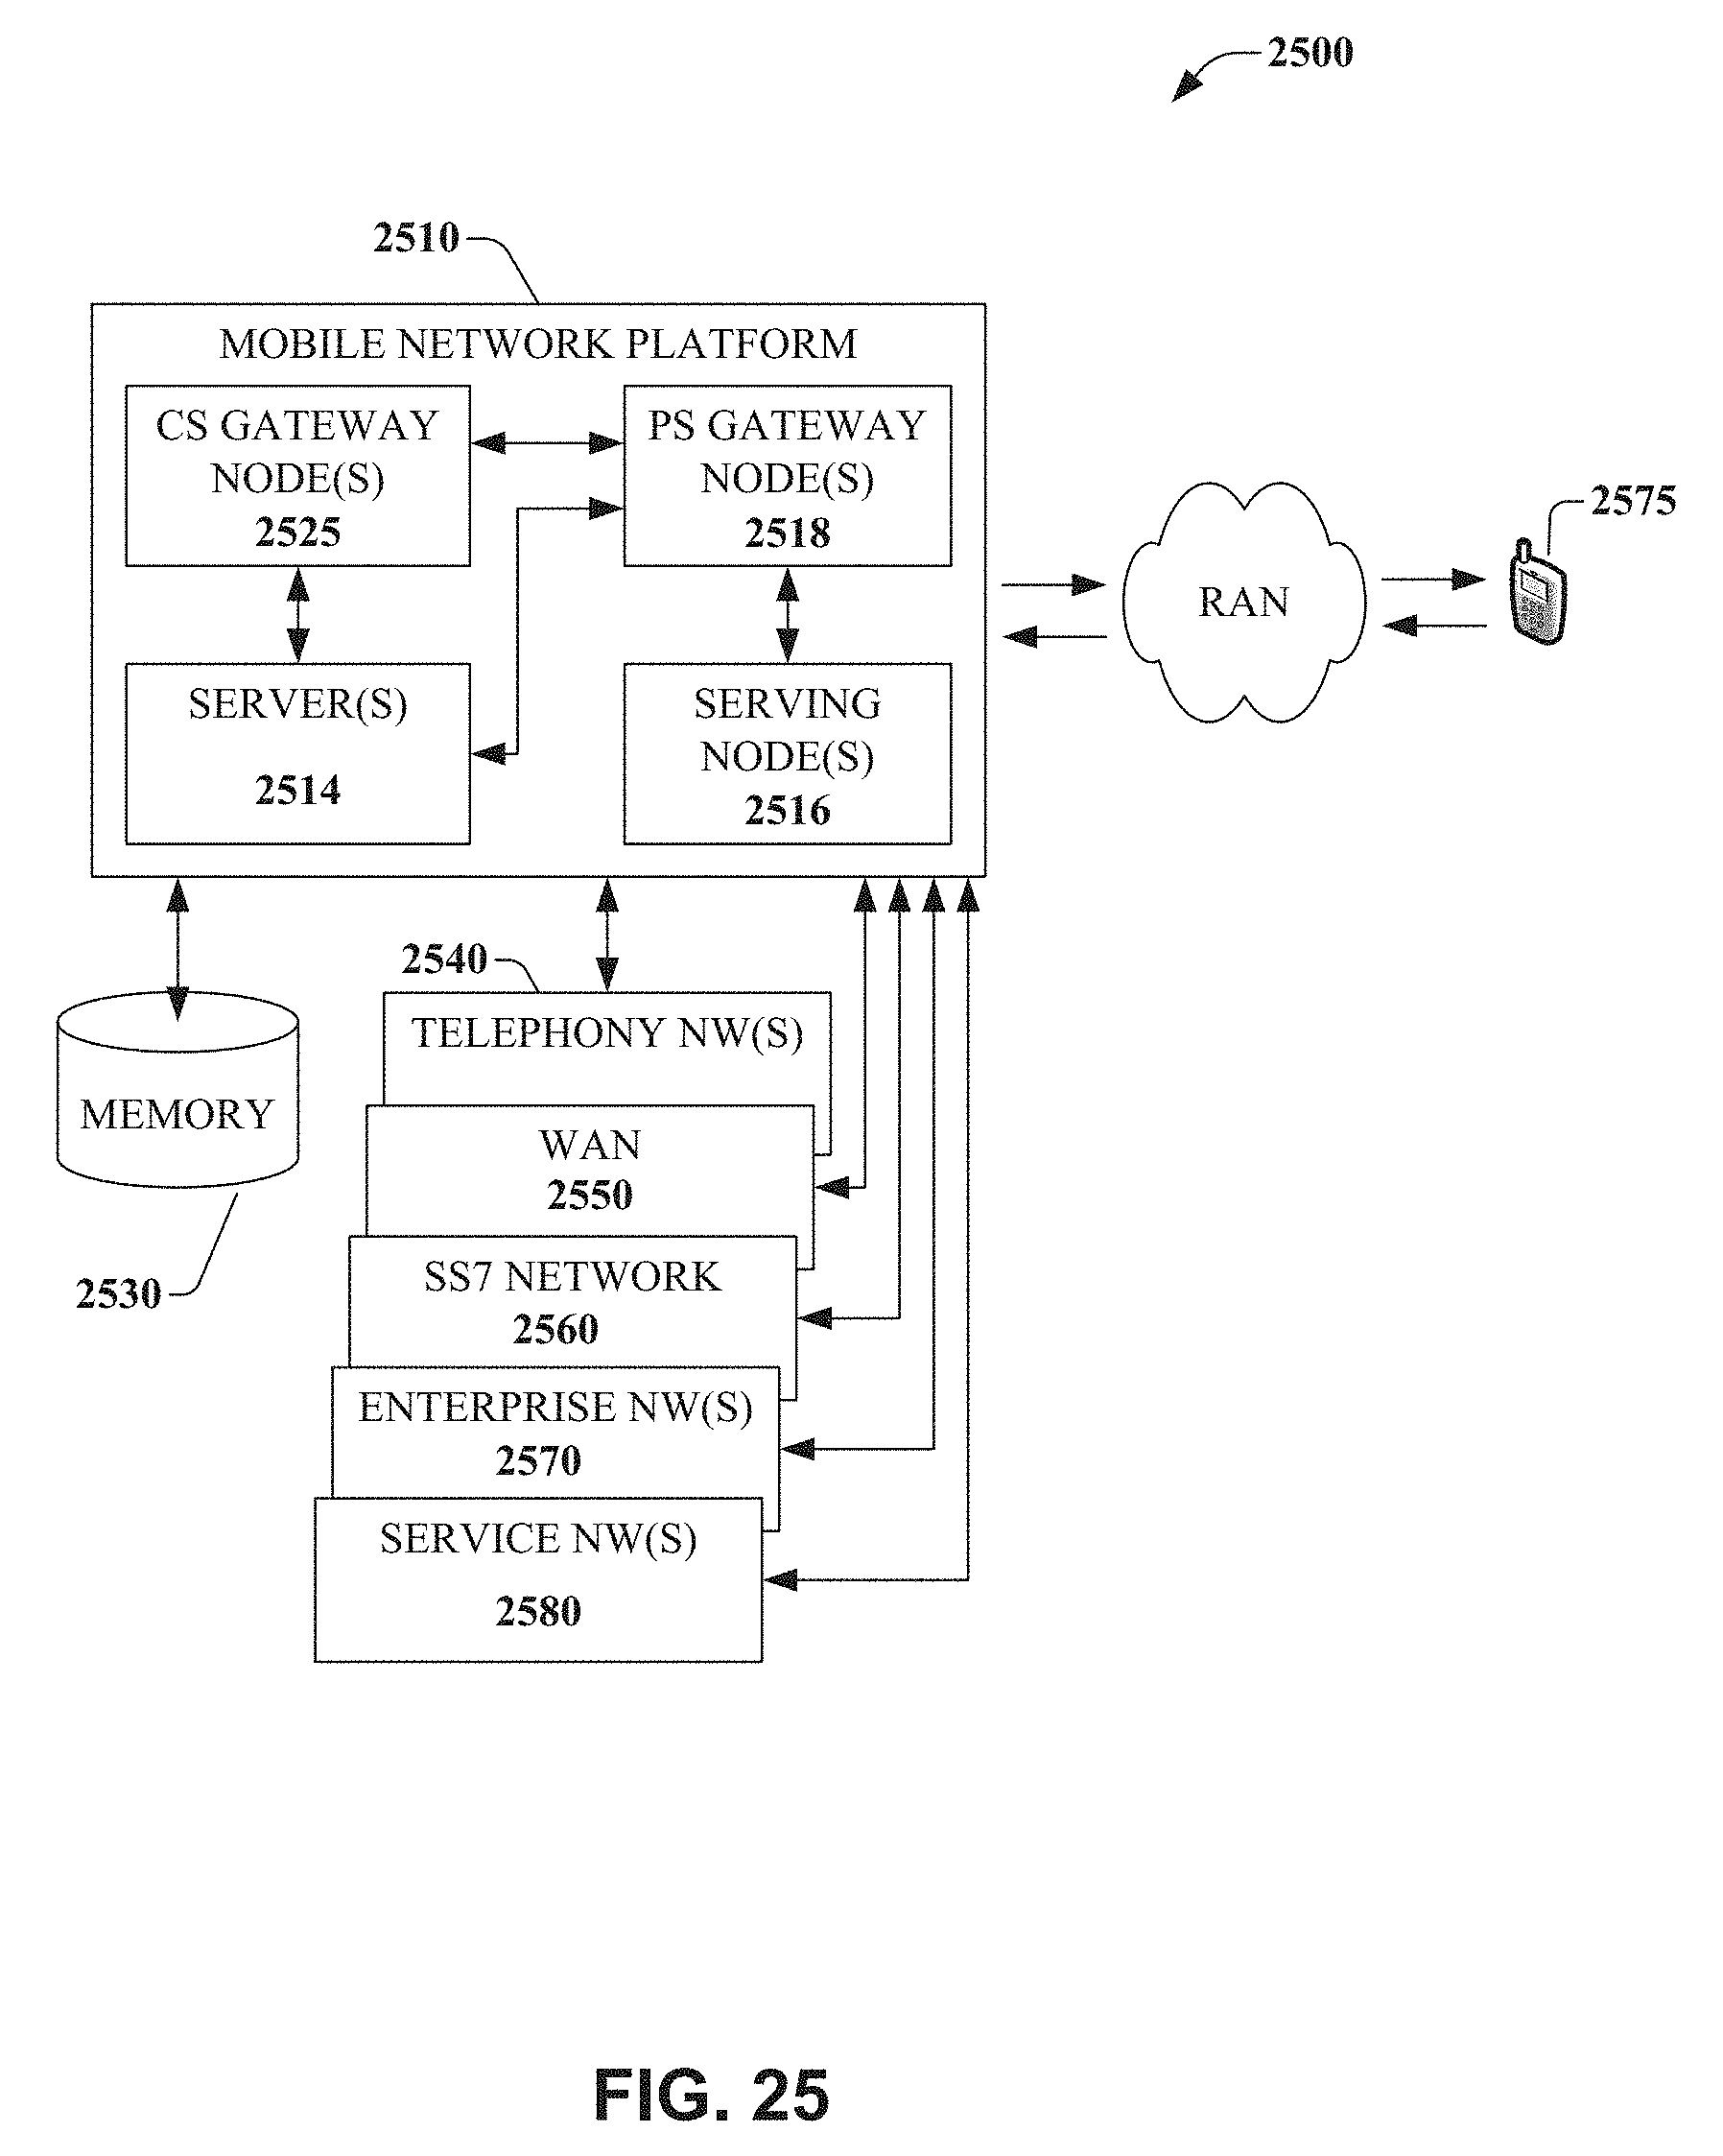 kium soul radio wiring diagram wiring diagram database Wiring Closet gold kium wiring diagram database kium gt4 sting wiring diagram database 03 kium spectra fuse box